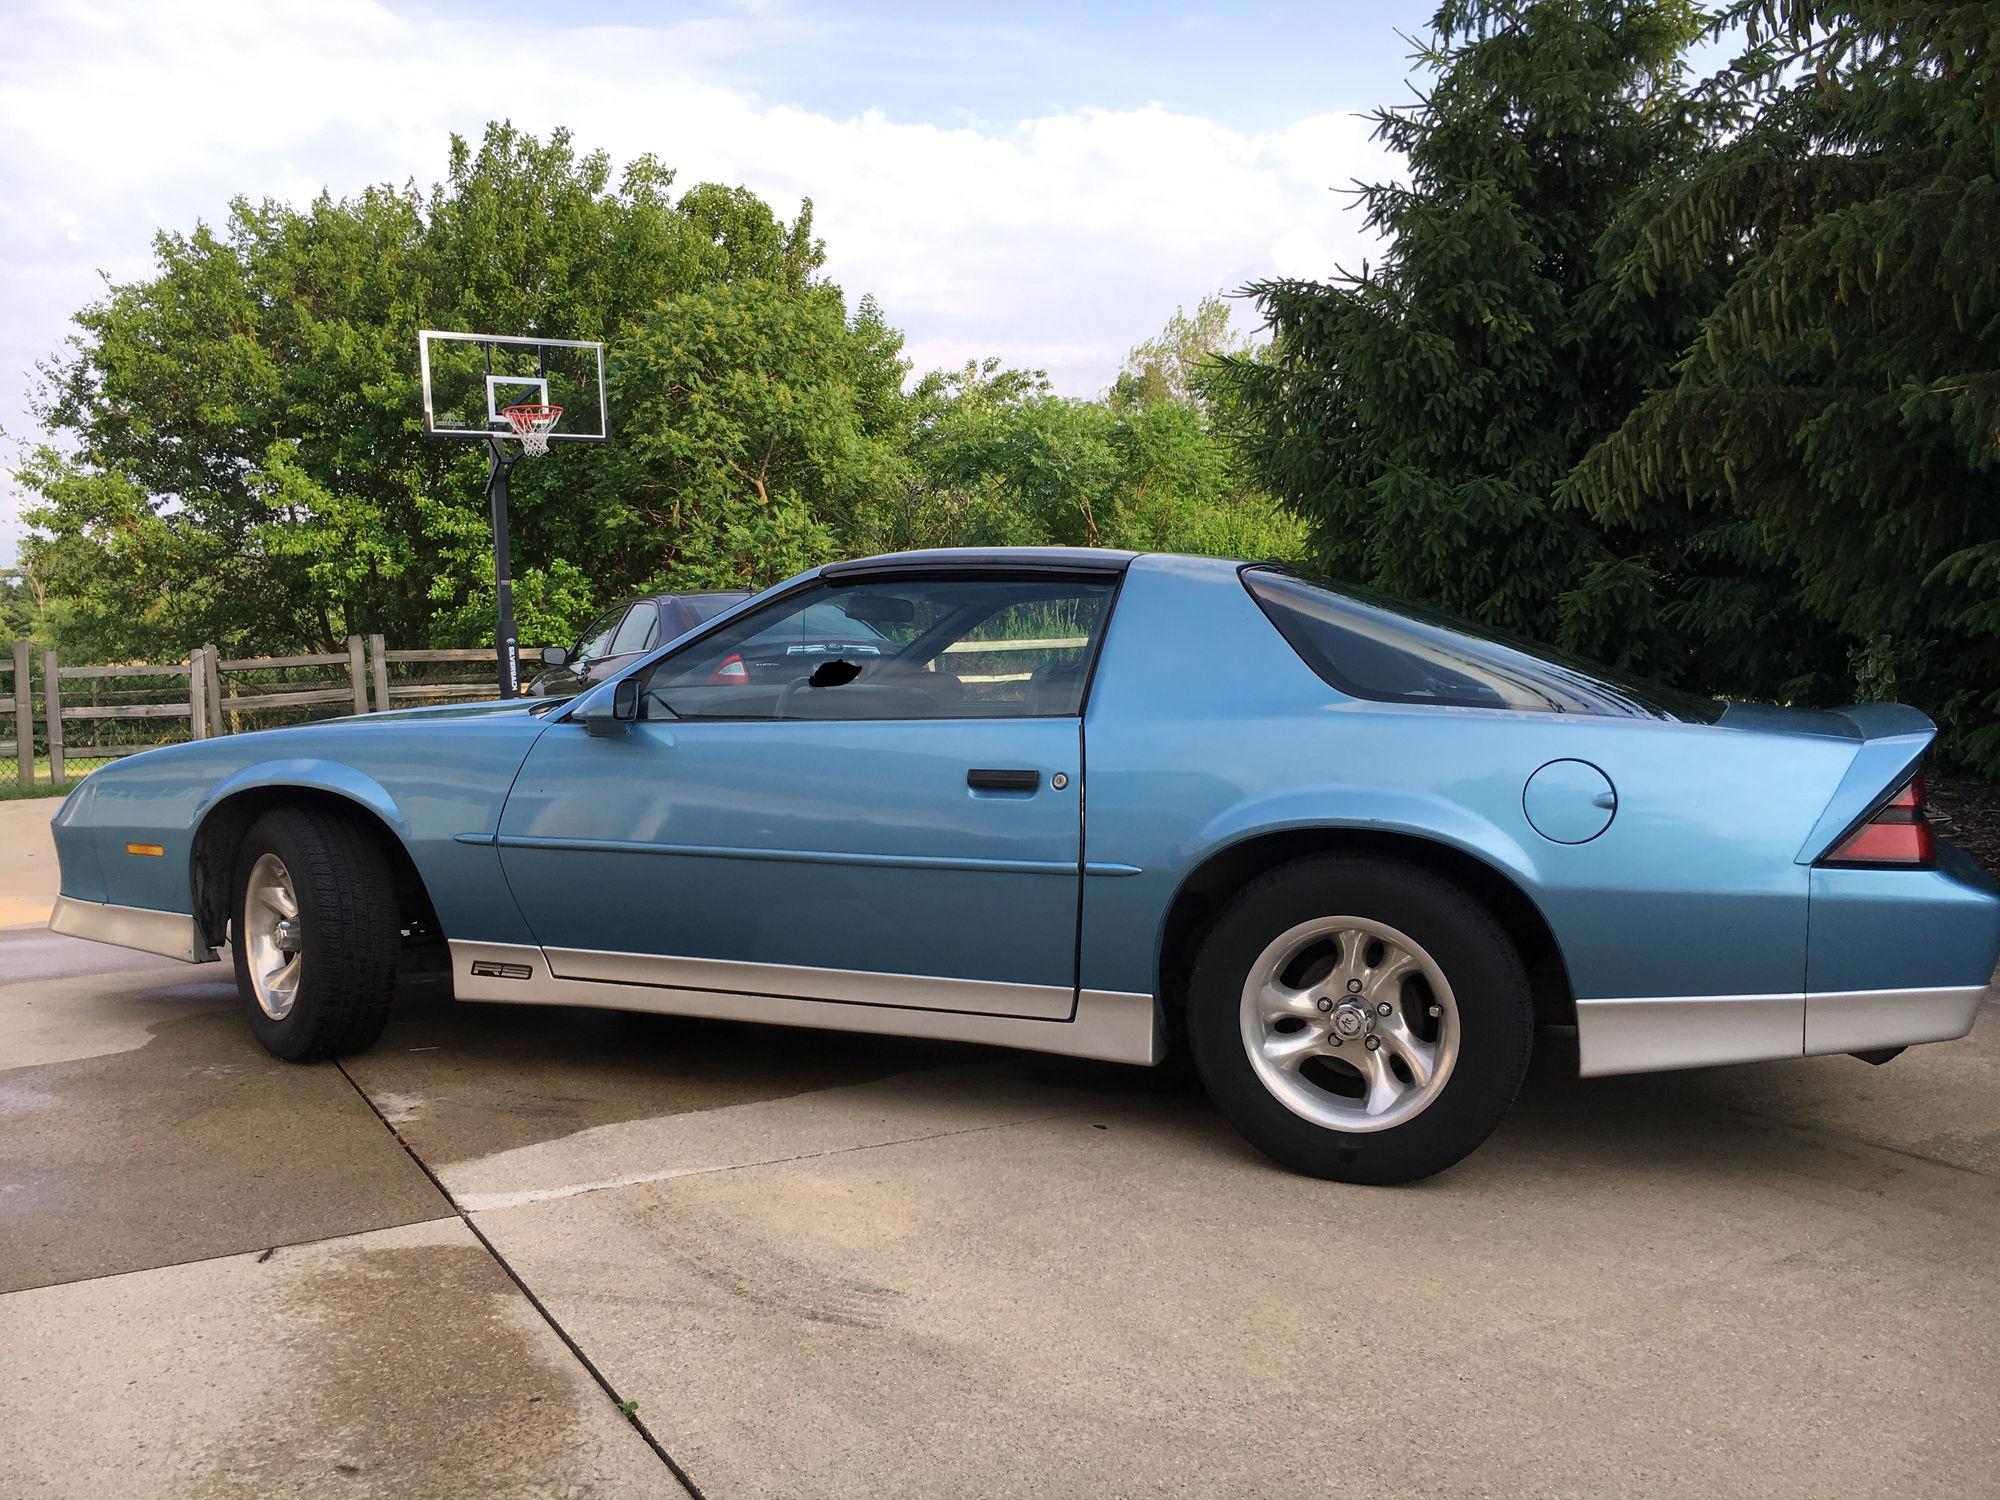 Michigan 1989 Blue Camaro Rs T Tops Third Generation F